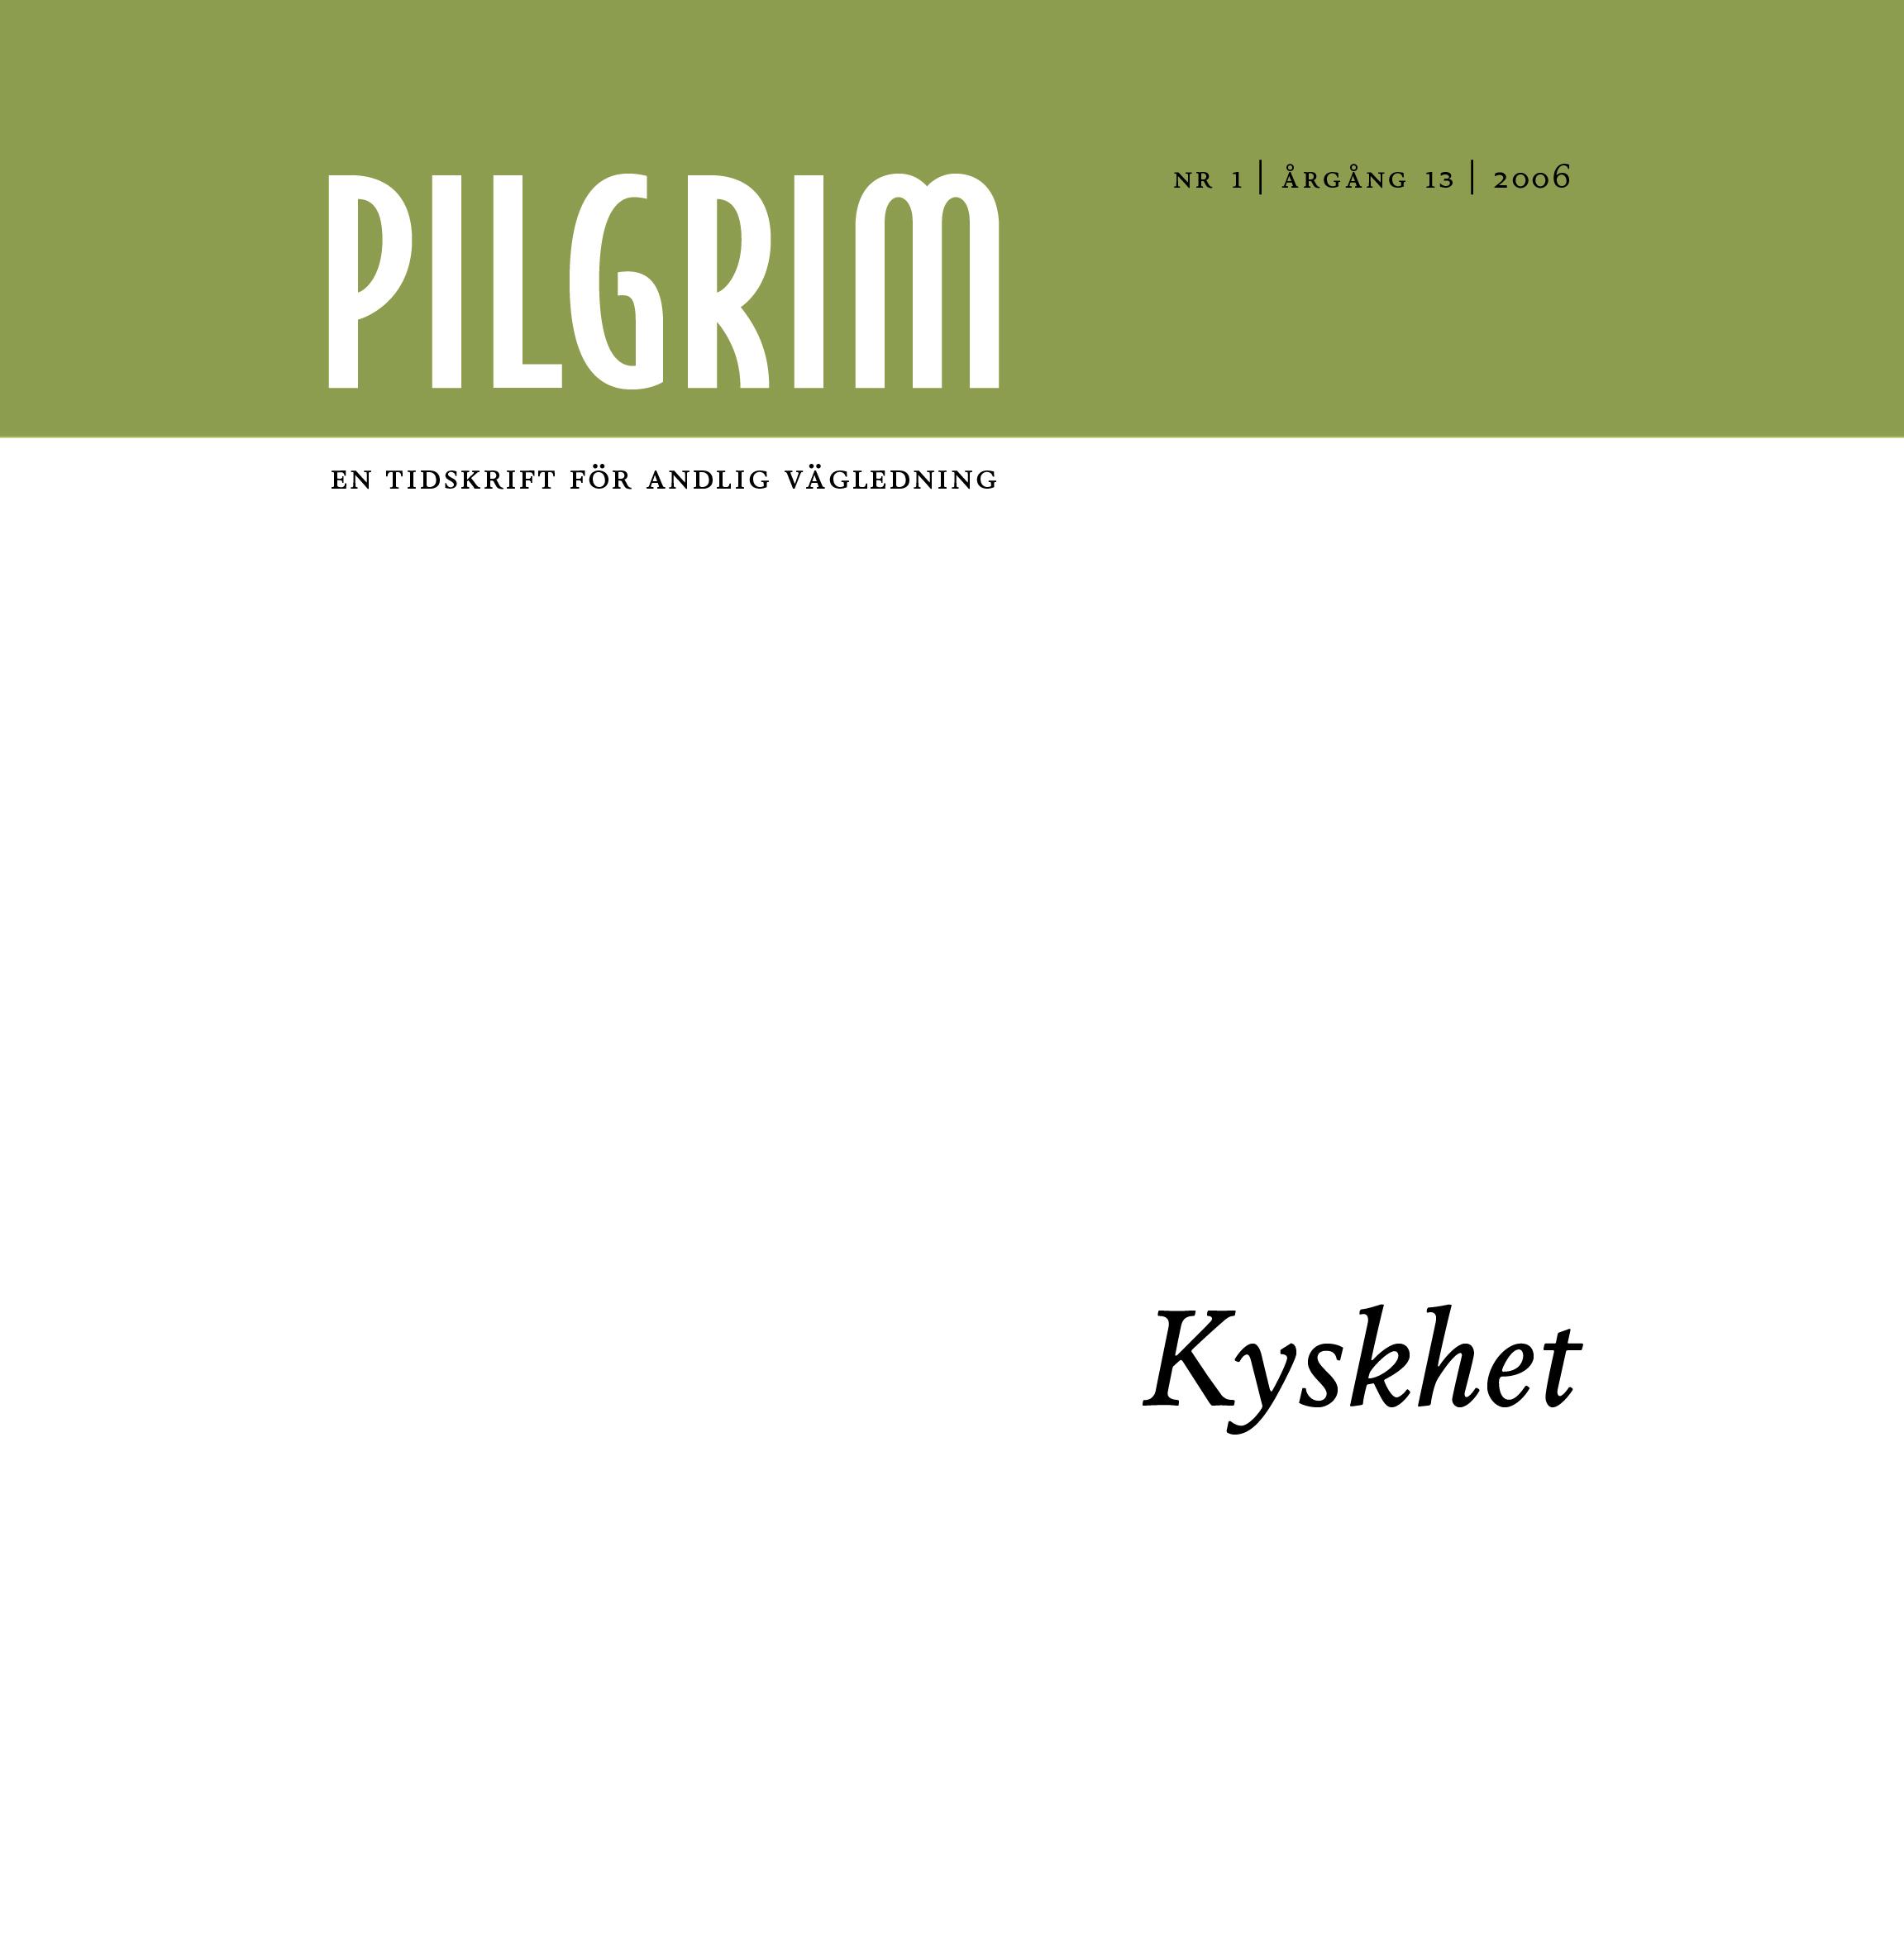 Pilgrim frams 2006-1